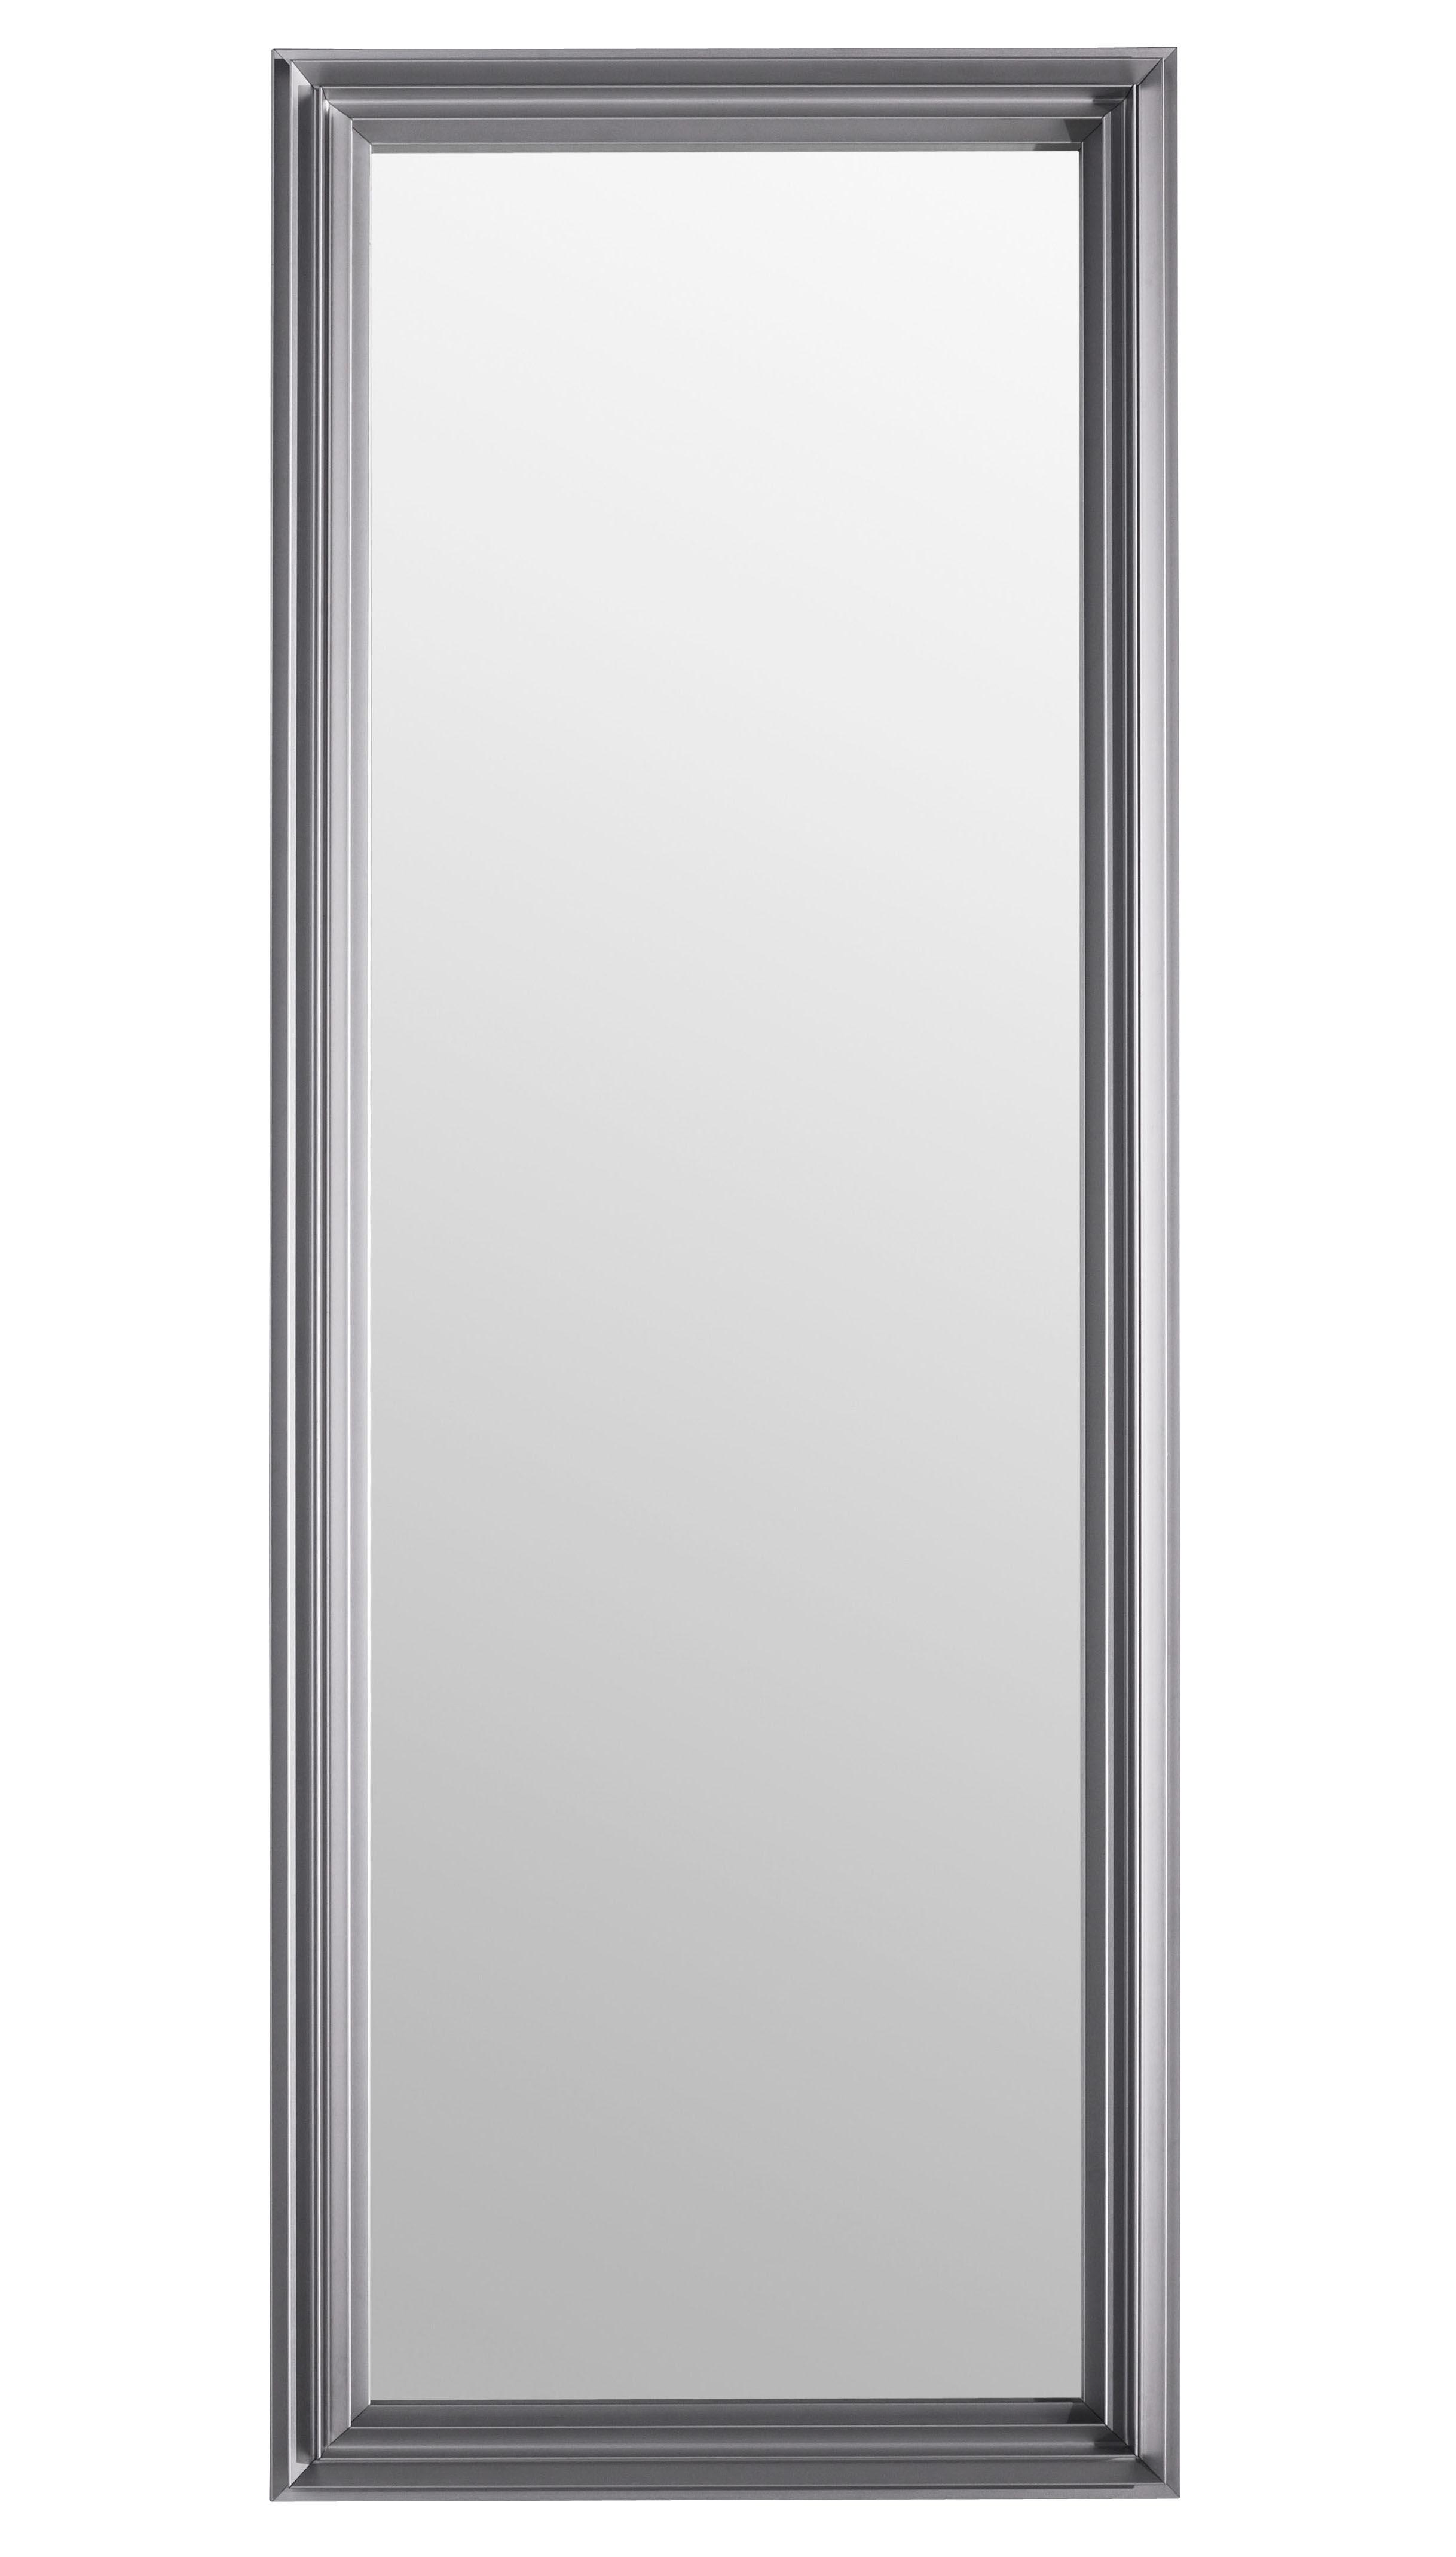 Miroir star system 90 x 240 cm aluminium rectangulaire for Miroir 90x30